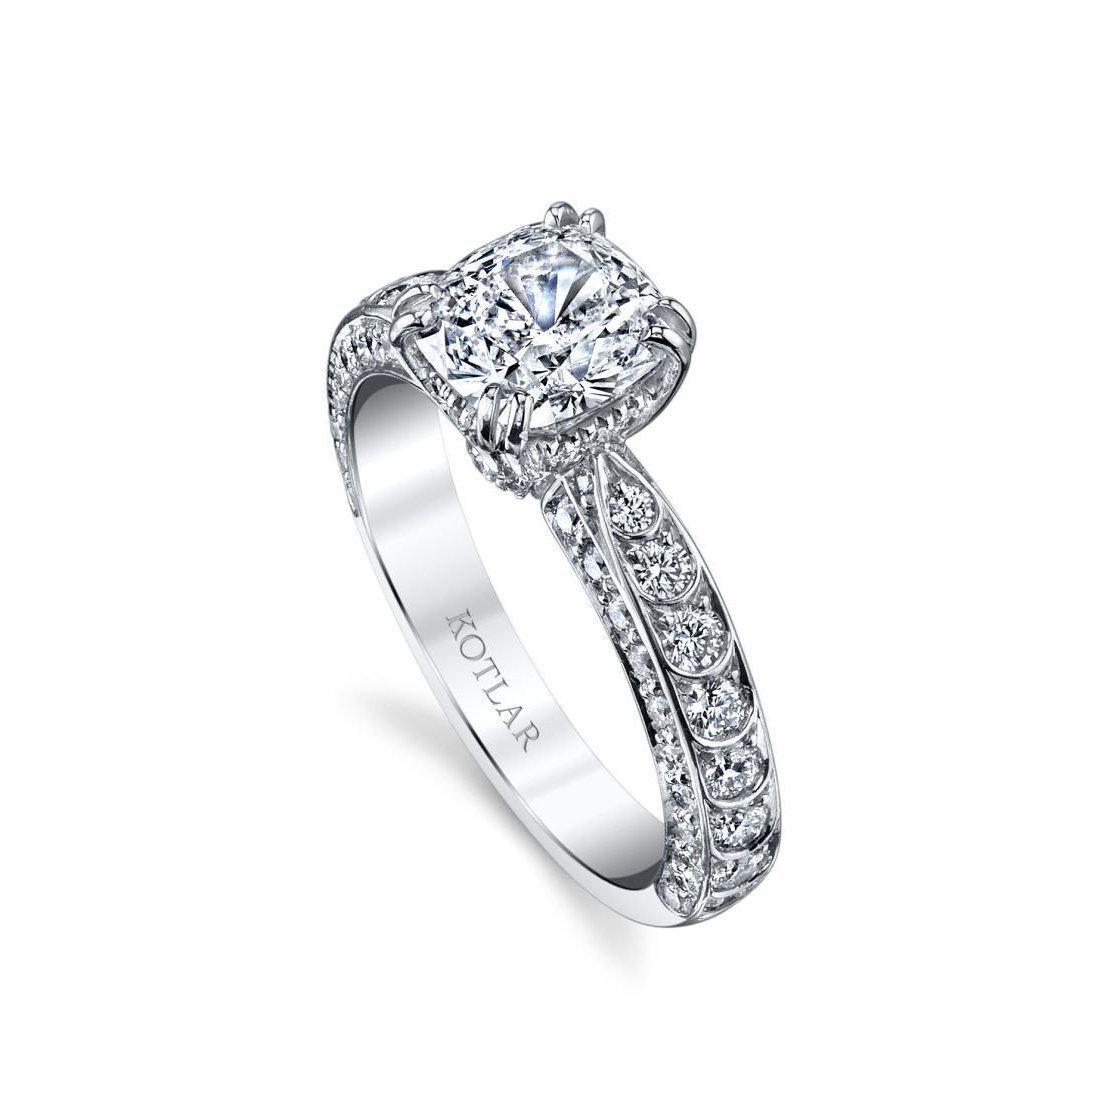 Harry Kotlar Round Brilliant Criss Cross Artisan Pave Ring - UK M - US 6 - EU 52 3/4 AJlBB